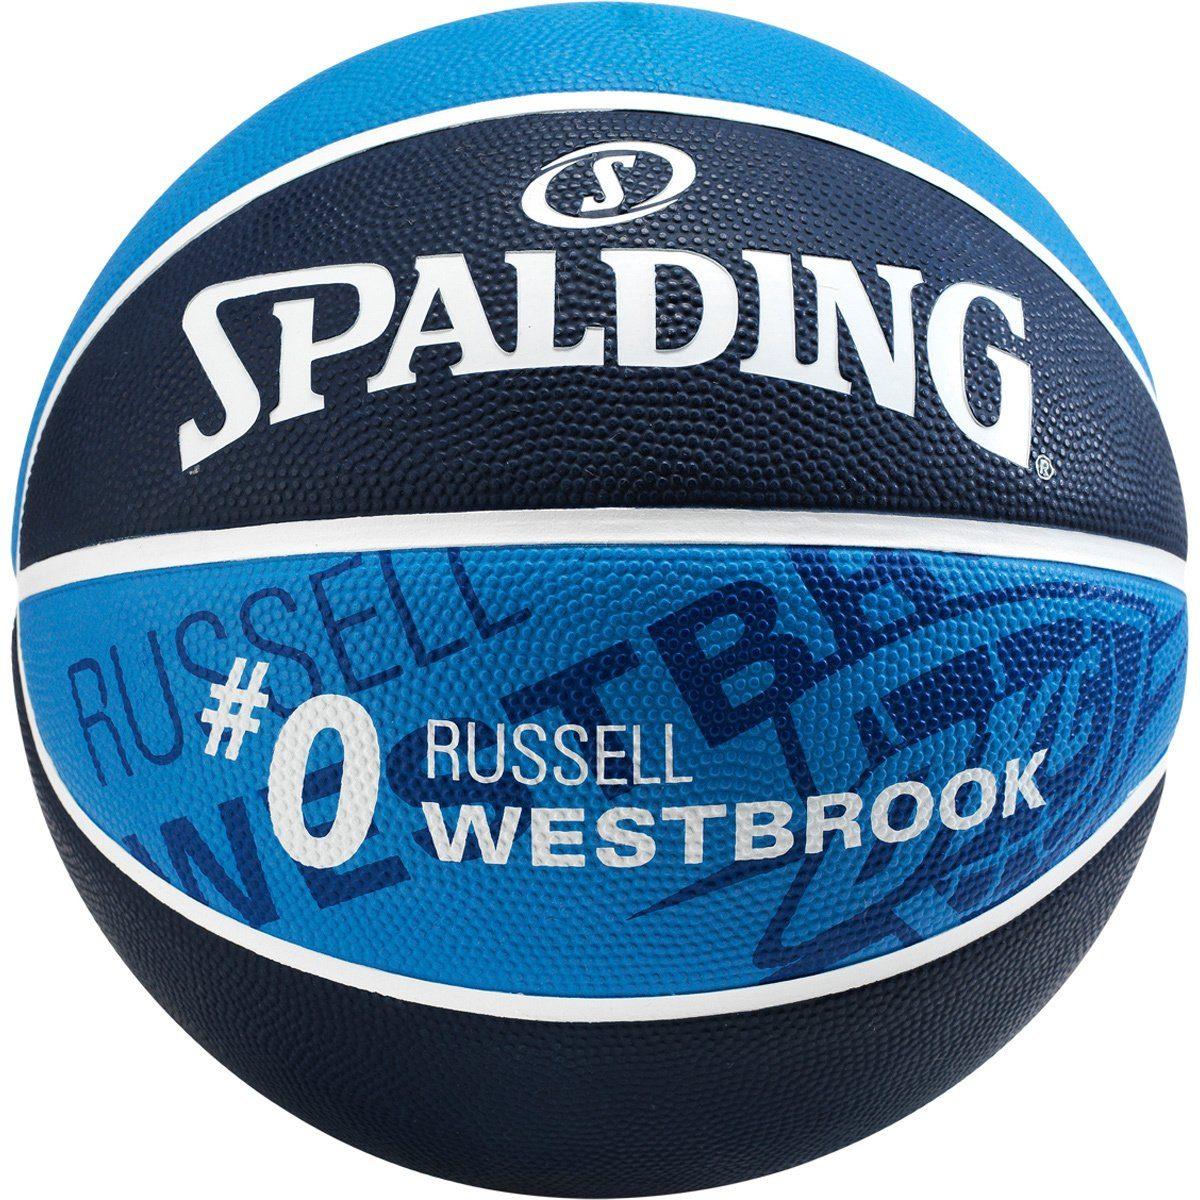 SPALDING NBA Player Russell Westbrook Basketball